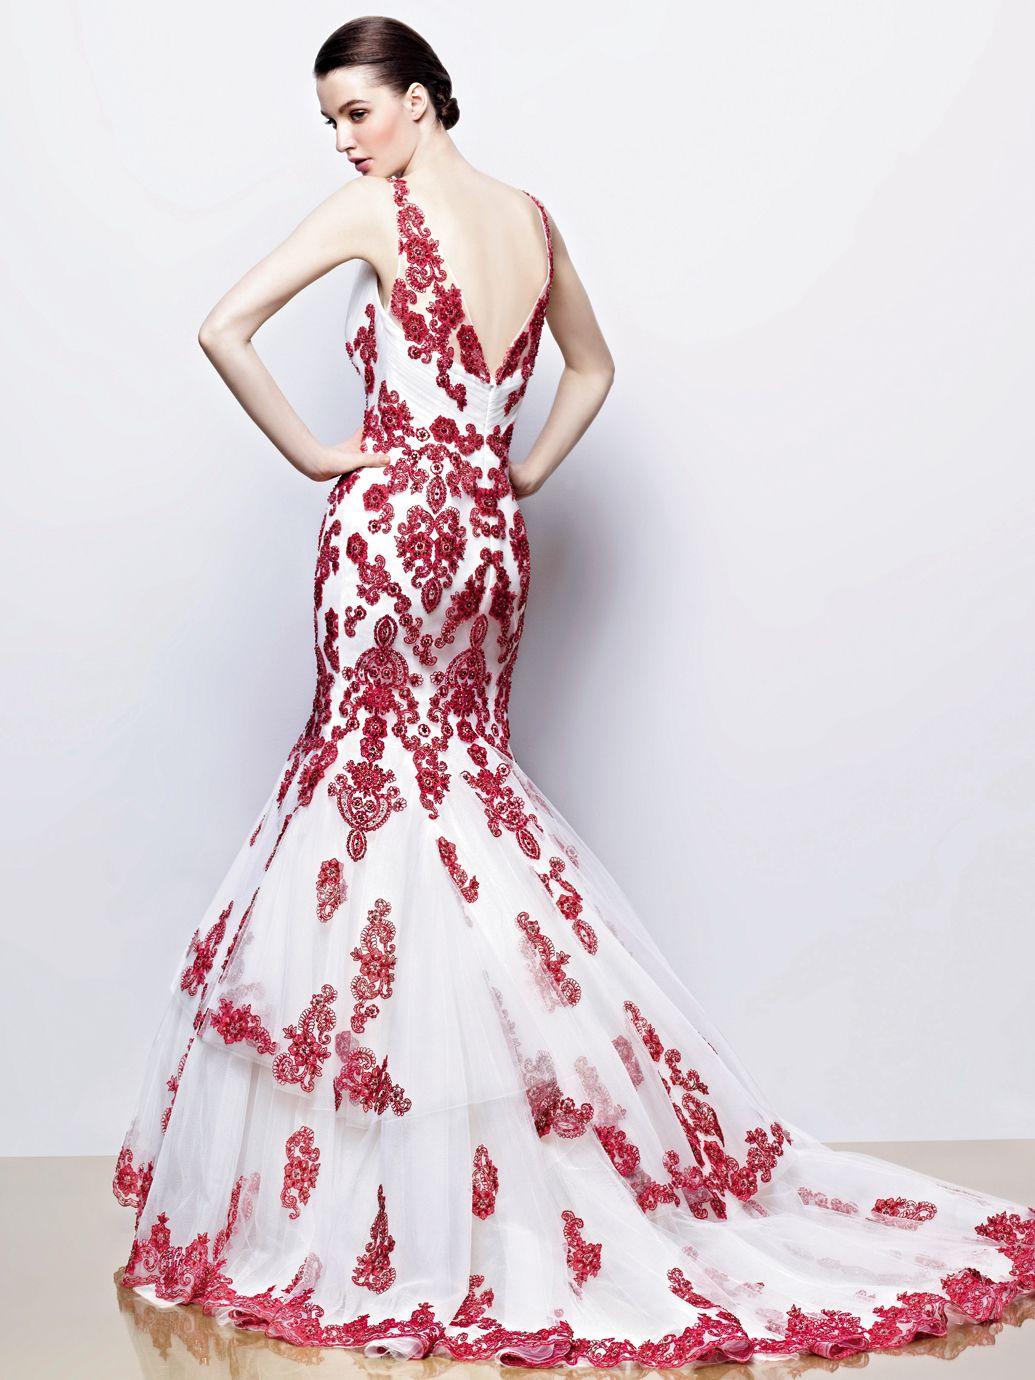 Enzoani Ilyssa Ivory / Red Wedding Dress #Wedding | Wedding stuff ...